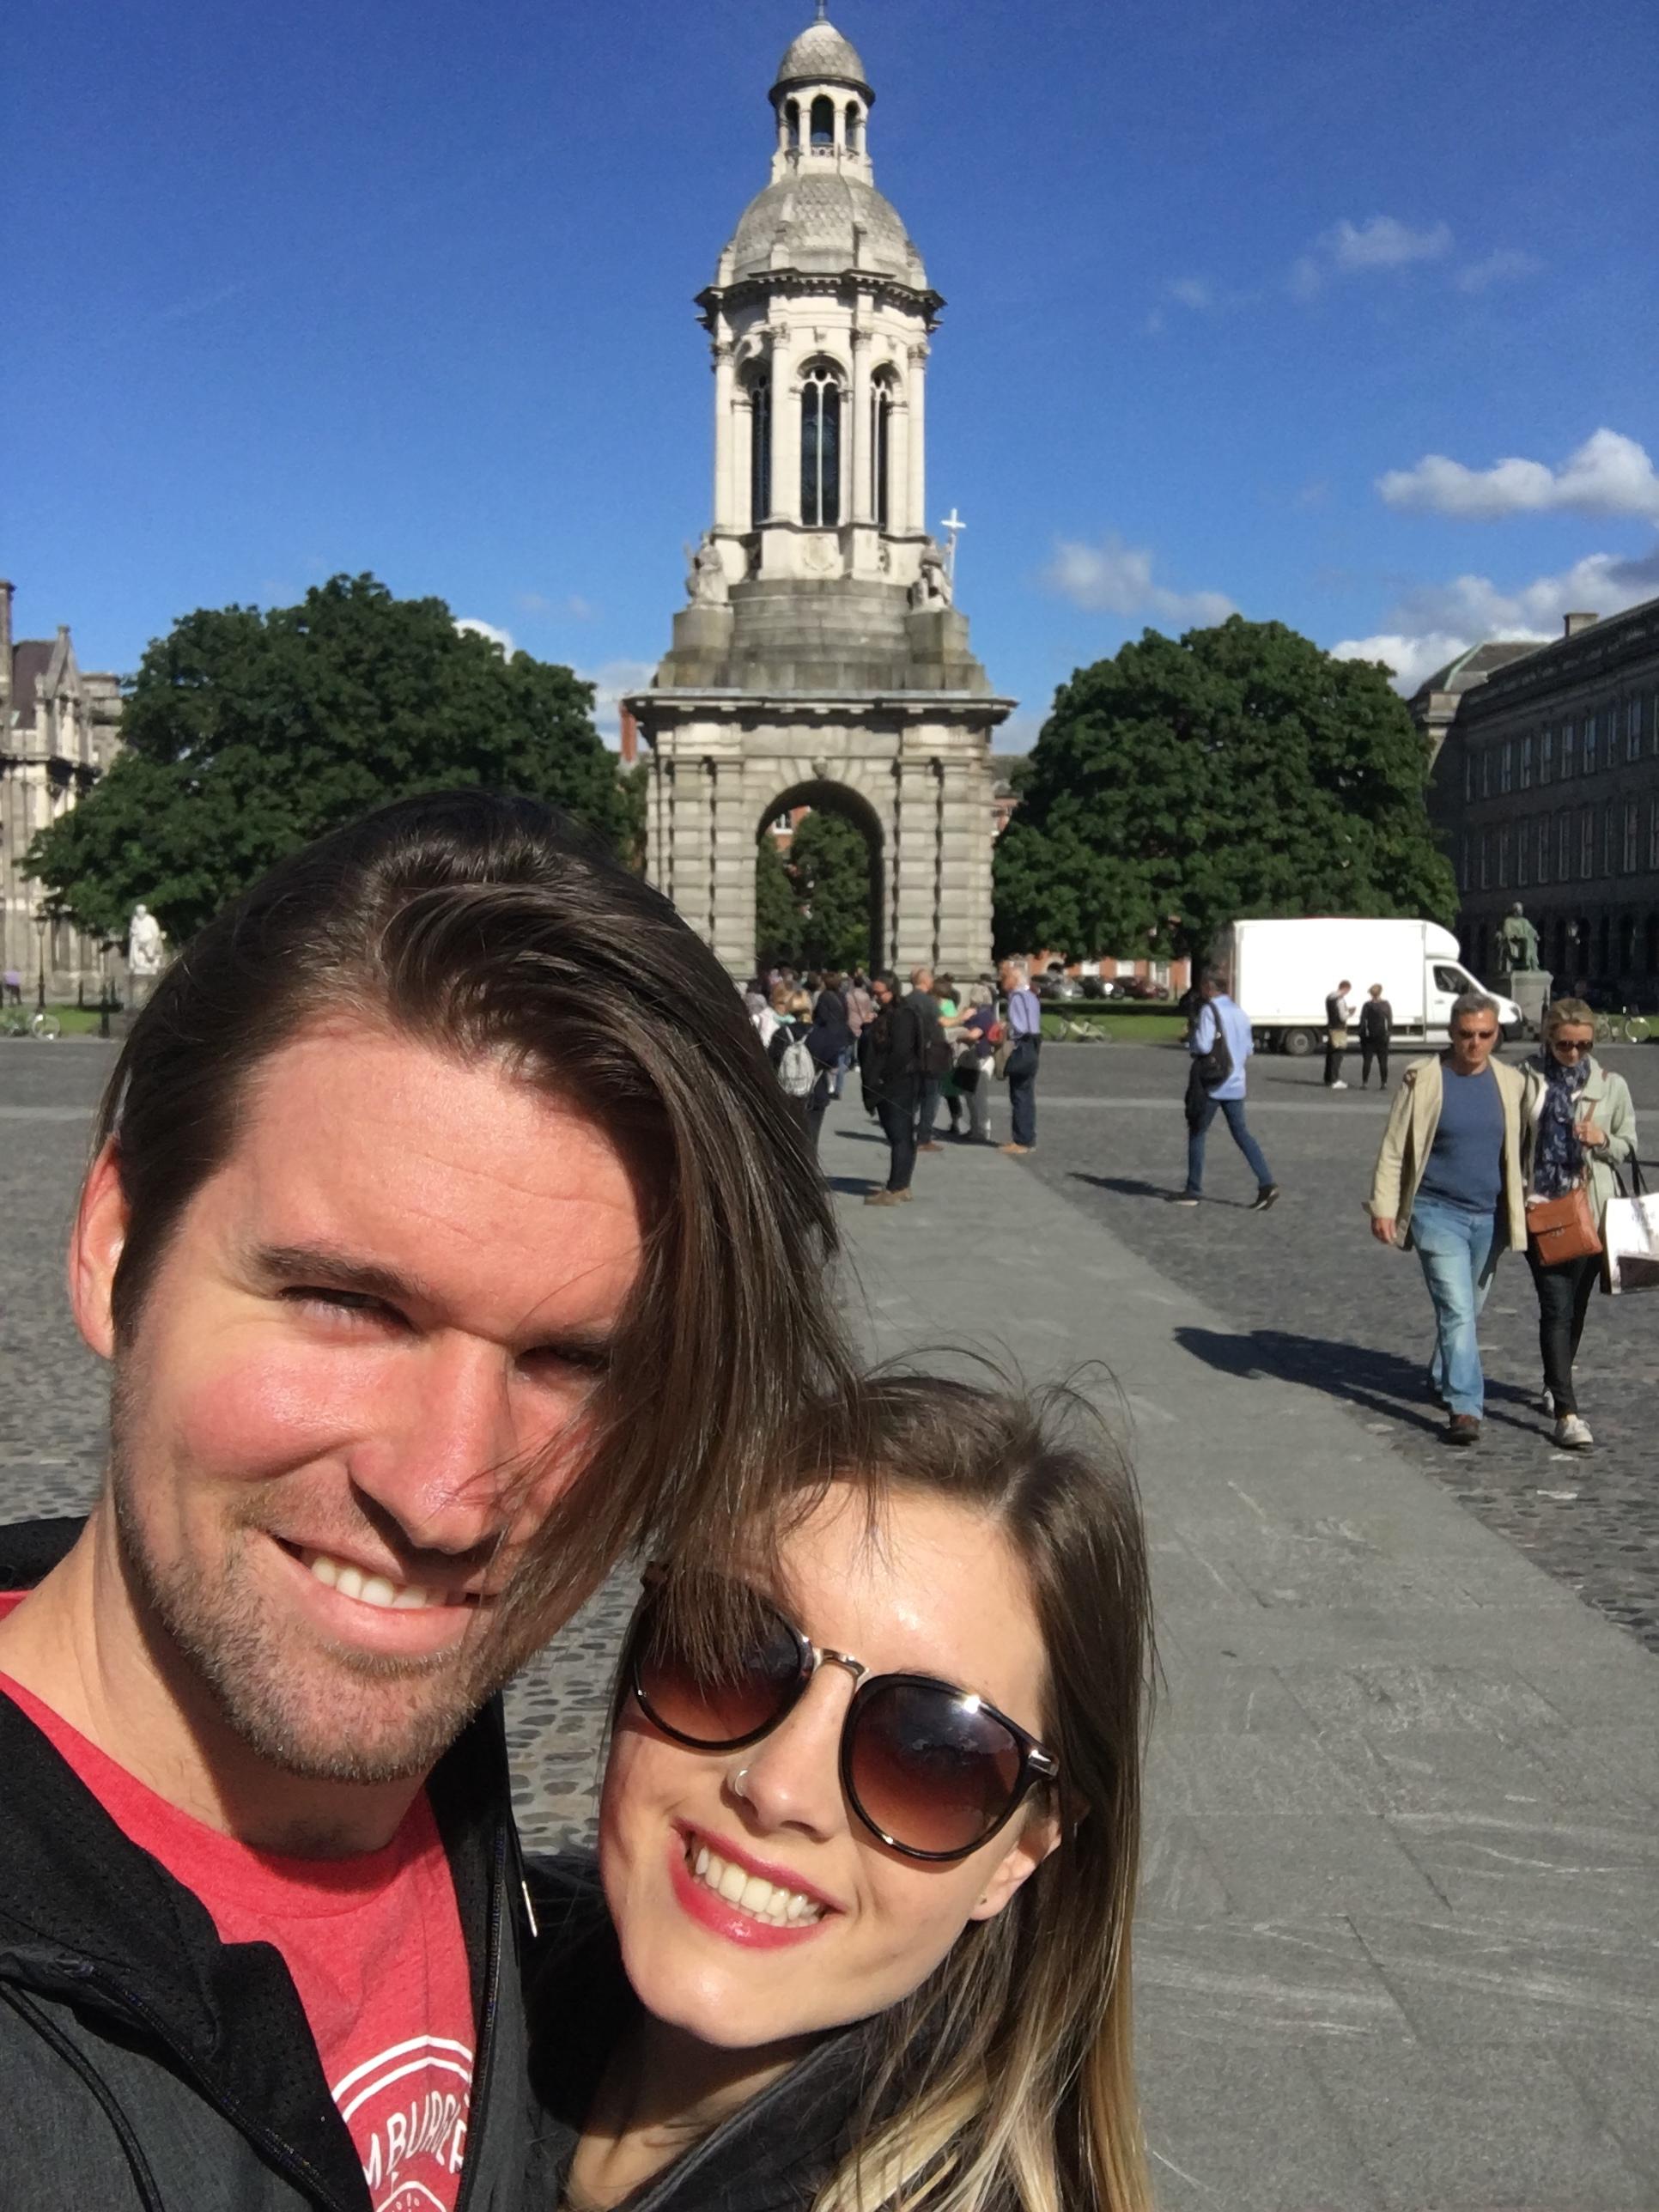 Dublin, Ireland - Sights to See